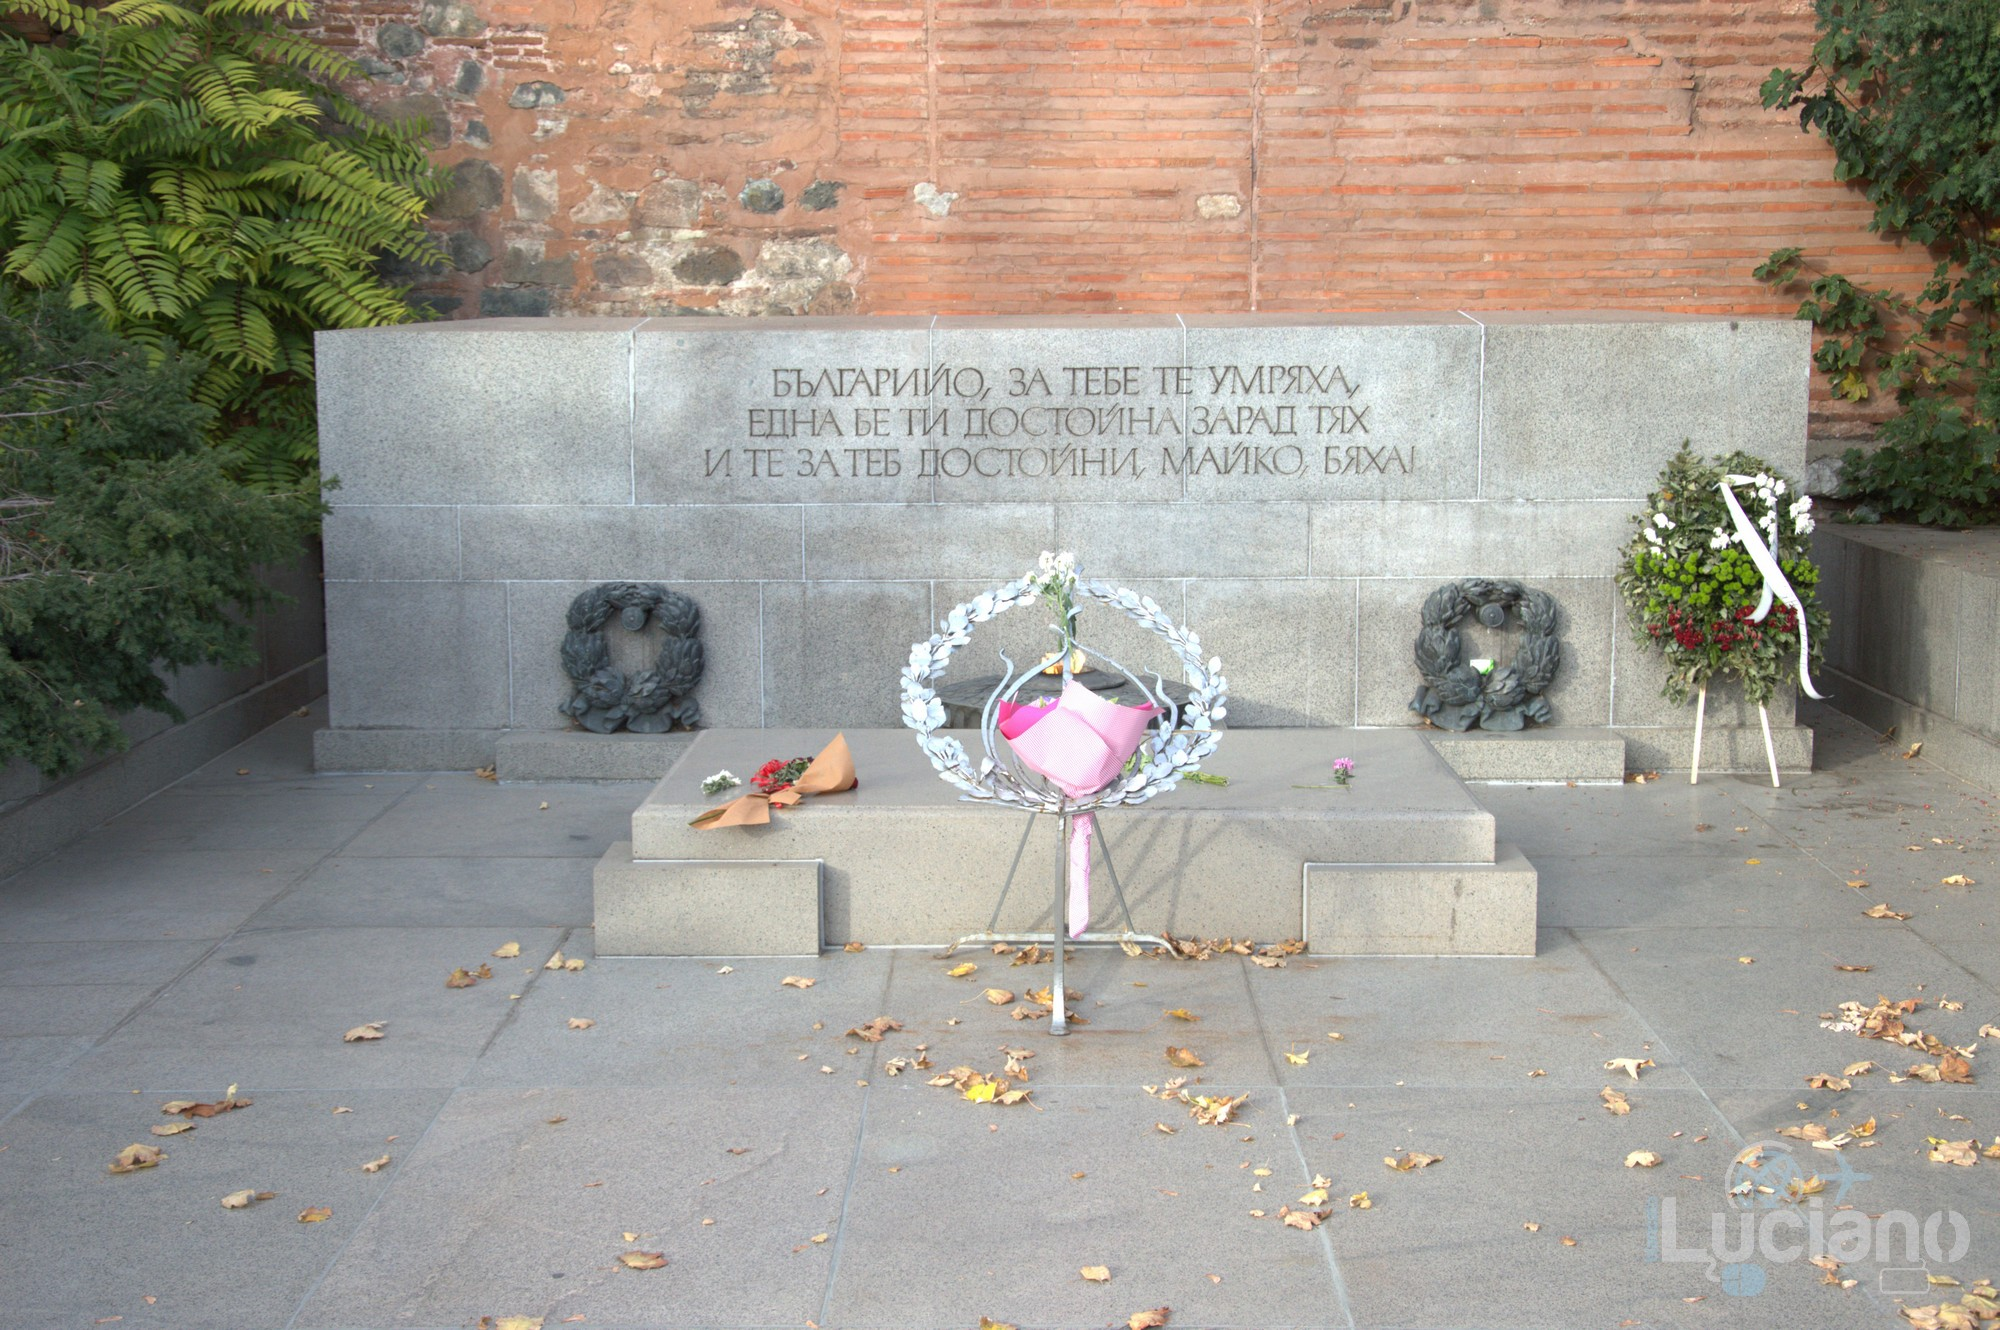 Monument of the Unknown Soldier - Паметник на незнайния воин - Sofia - Bulgaria